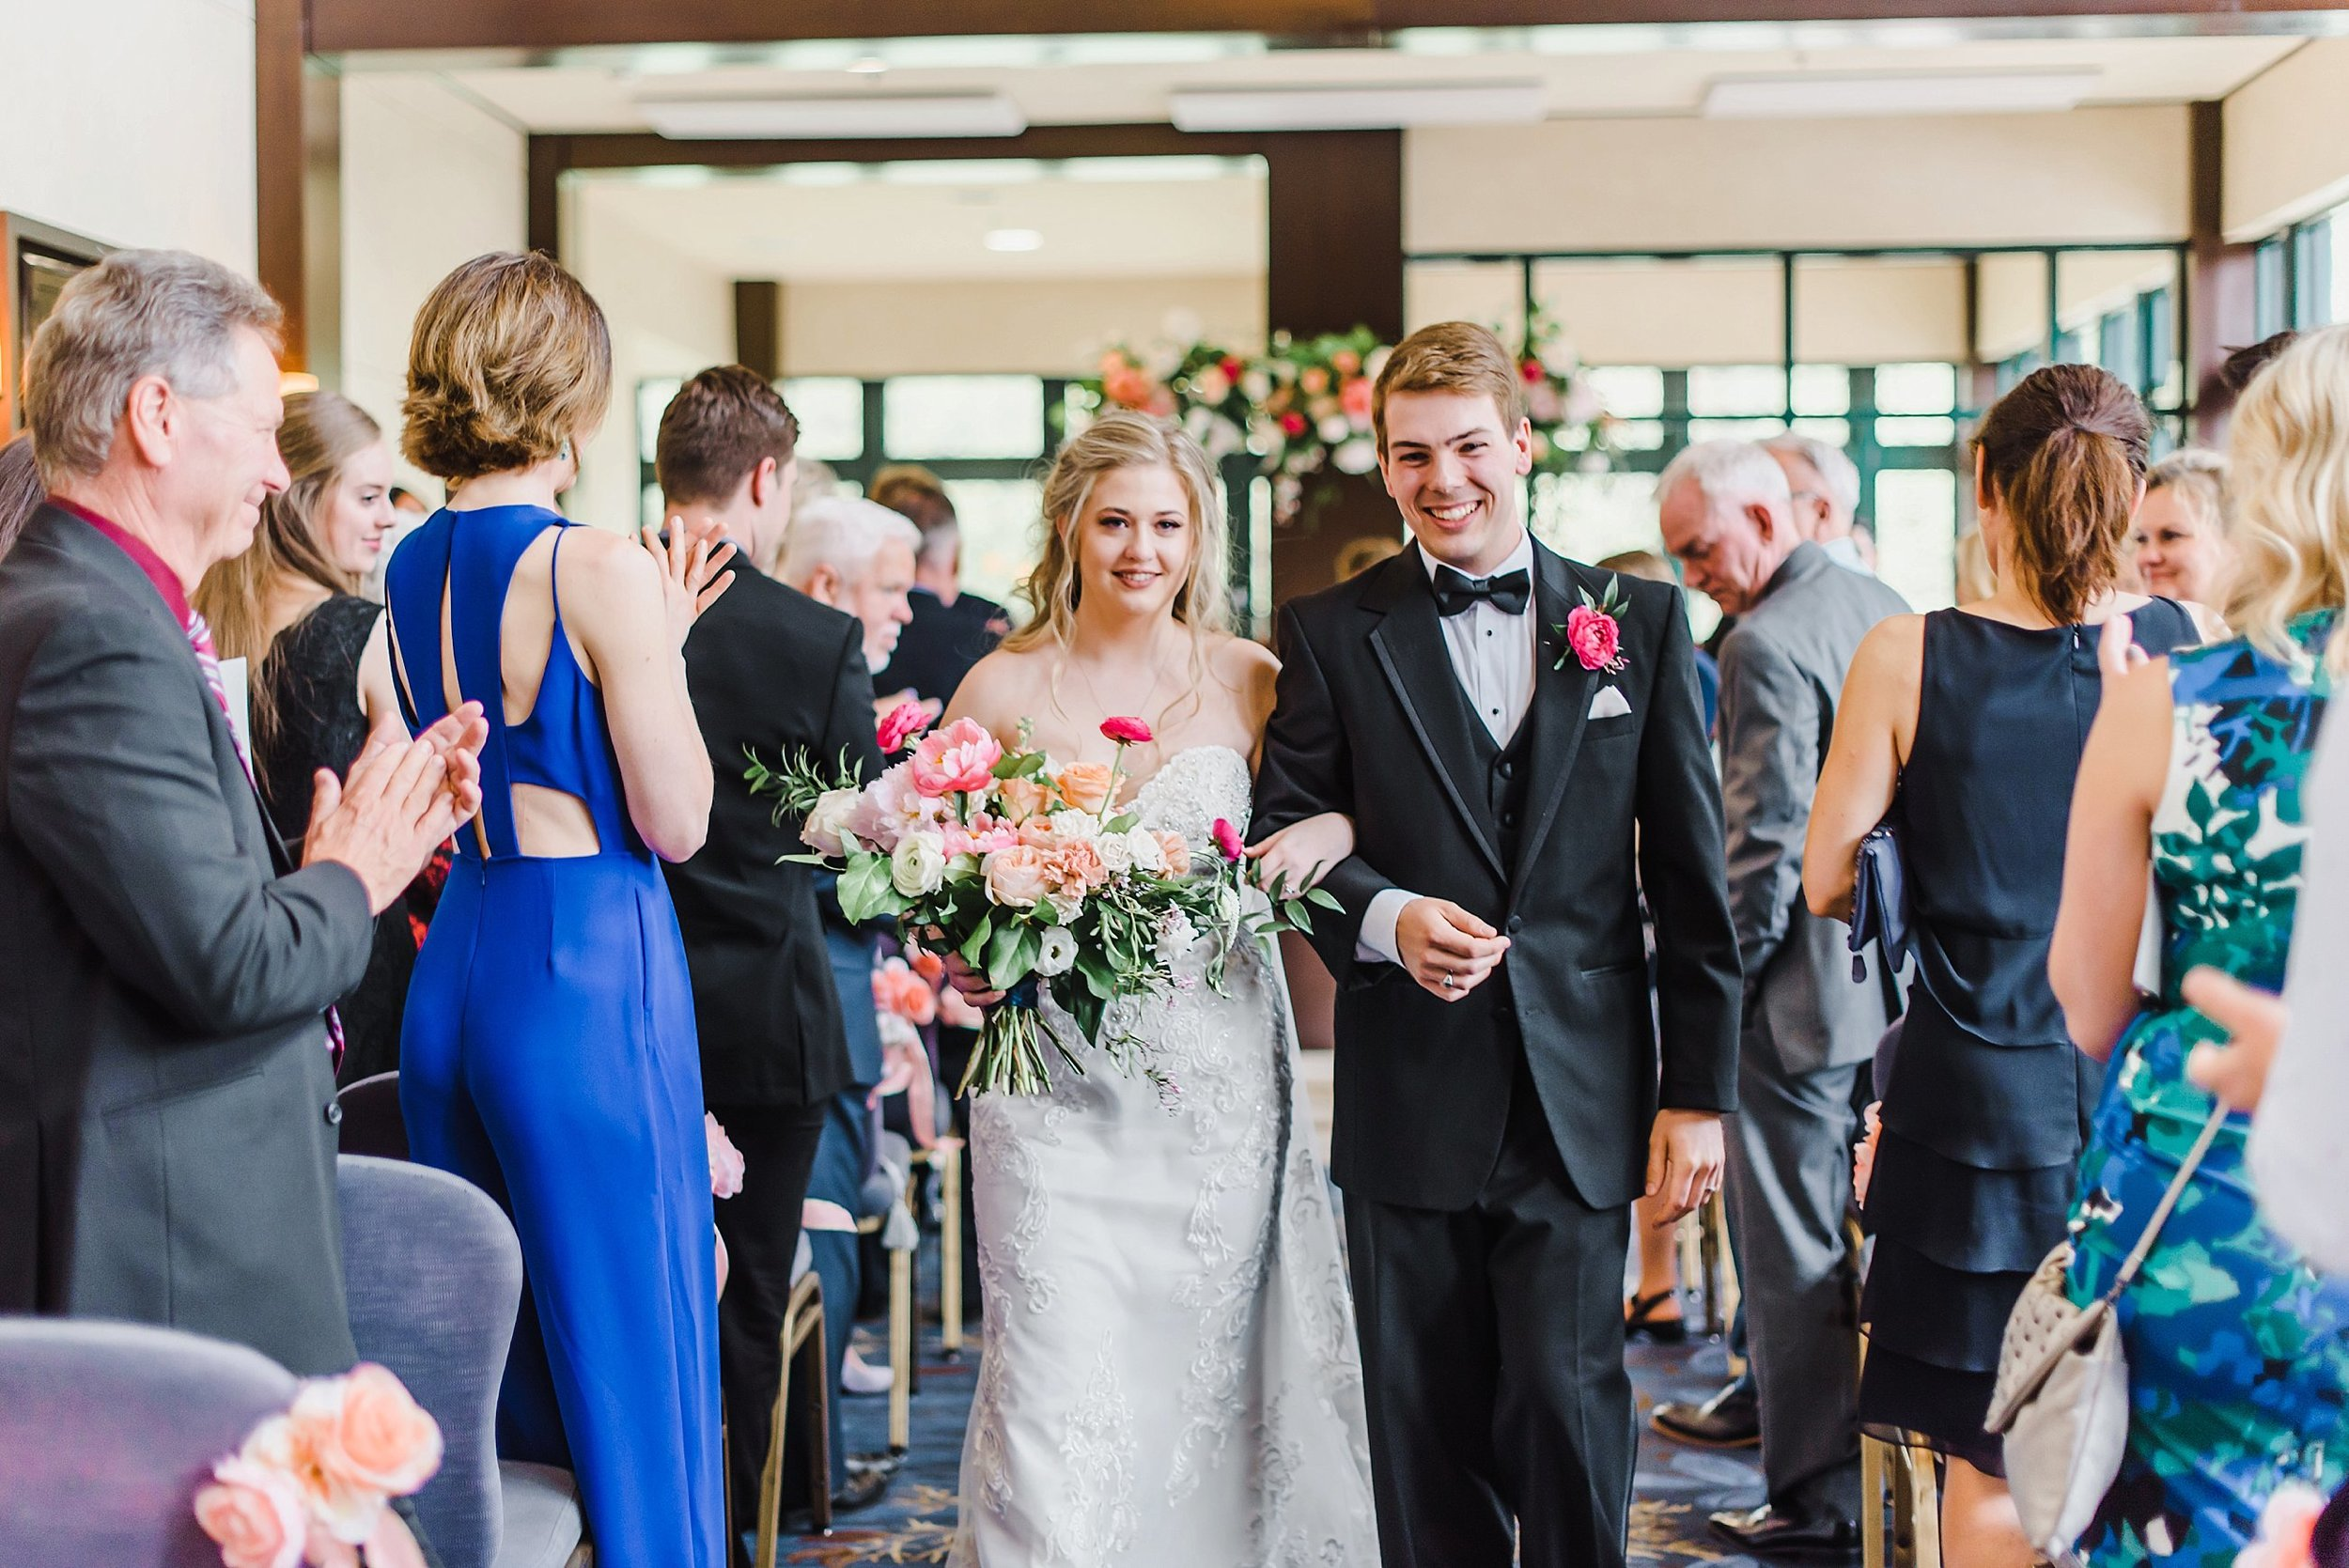 light airy indie fine art ottawa wedding photographer | Ali and Batoul Photography_0170.jpg